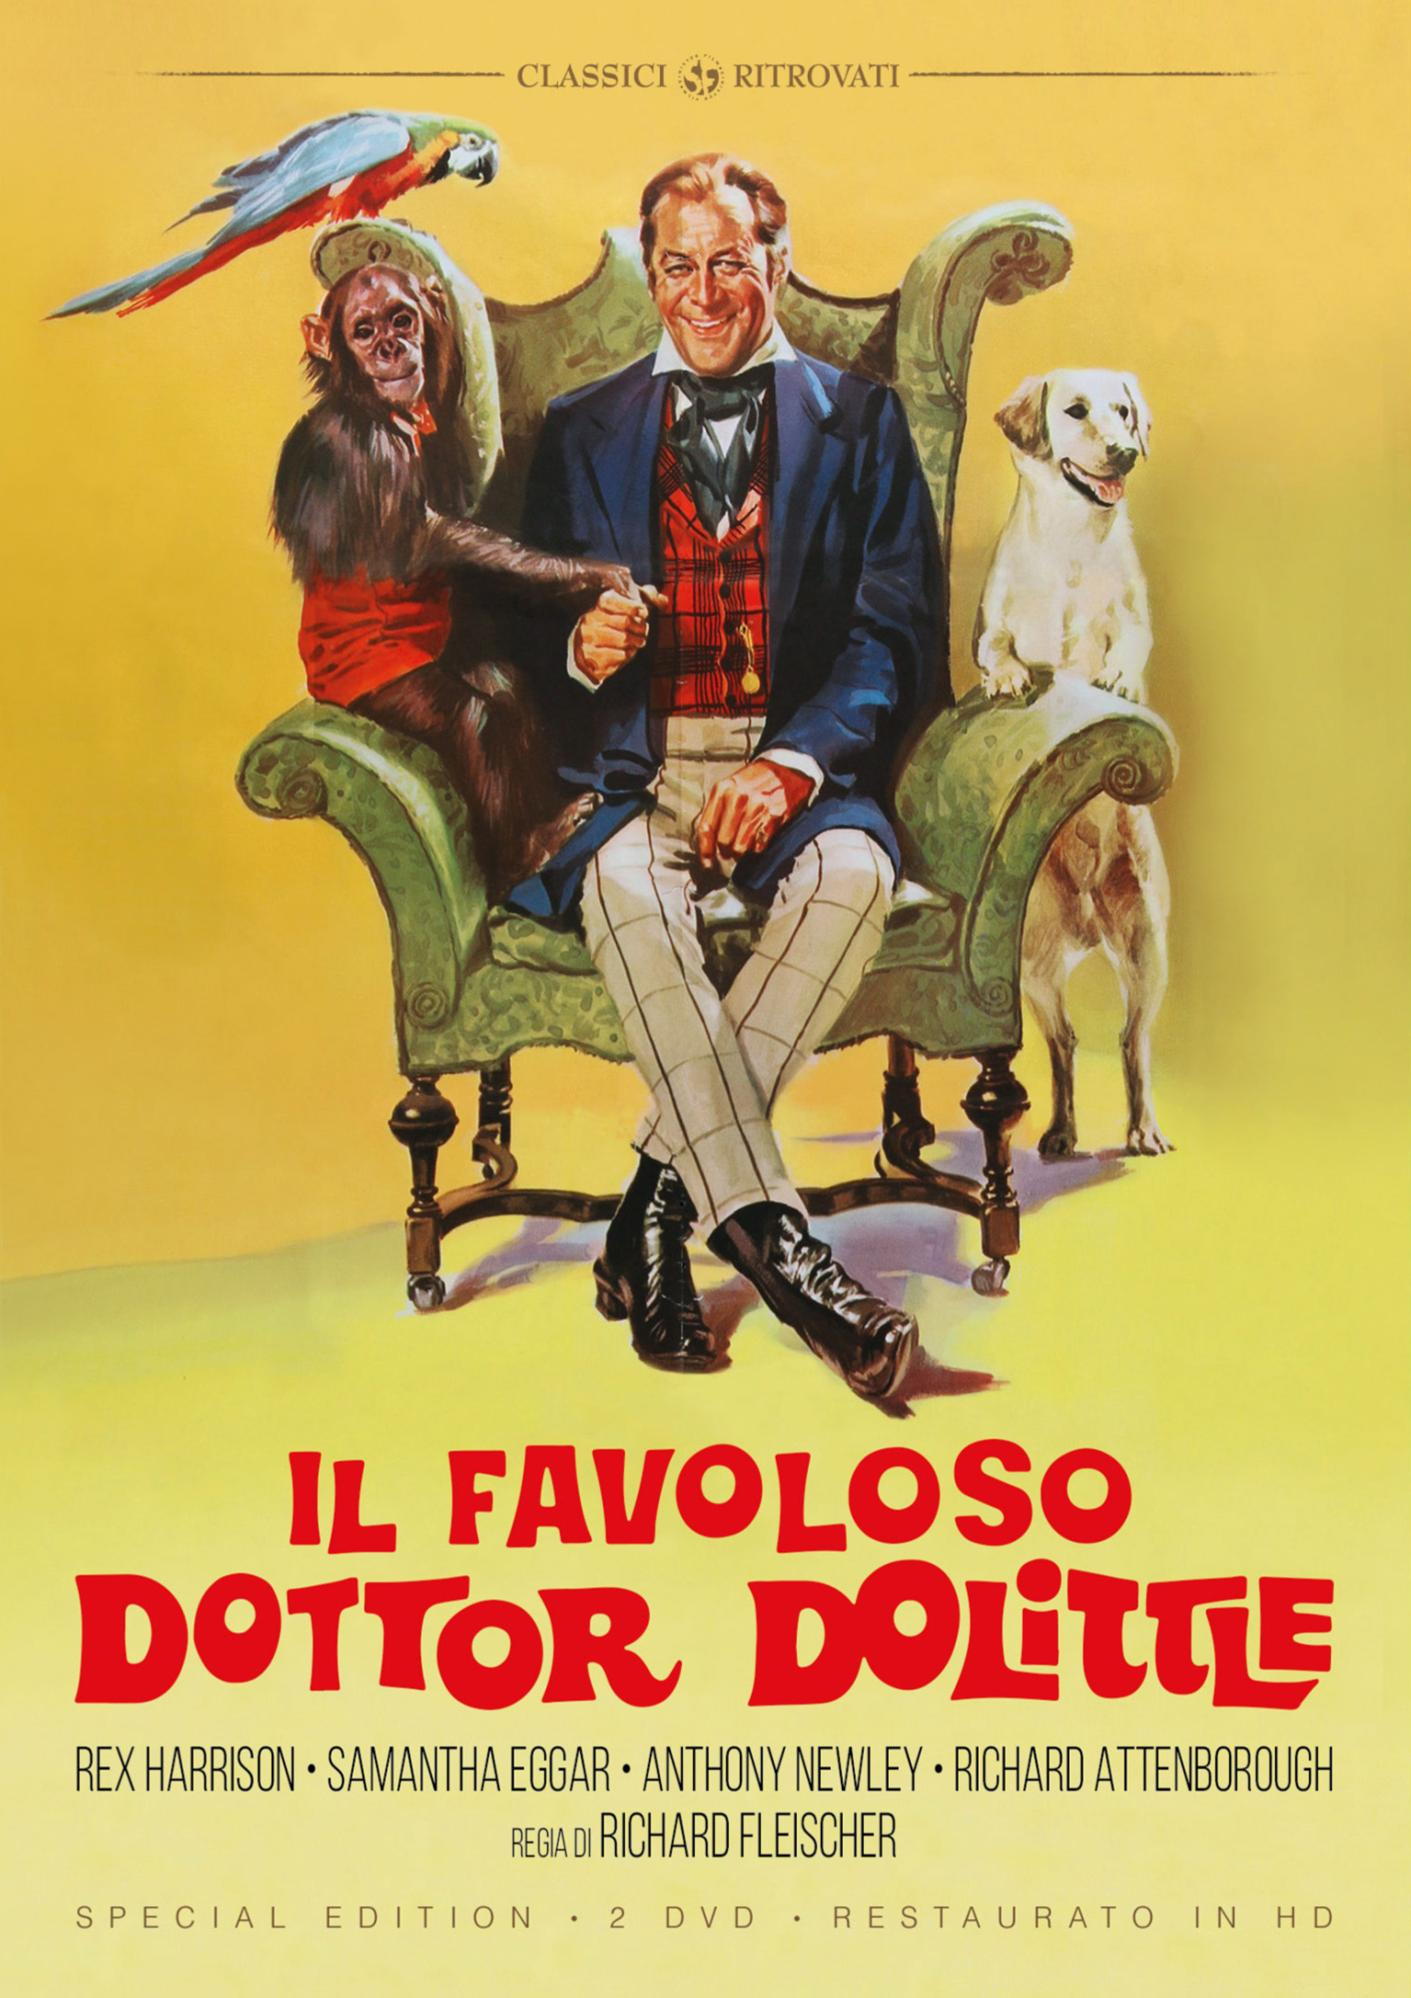 IL FAVOLOSO DR. DOLITTLE (RESTAURATO IN HD) (SPECIAL EDITION) (2